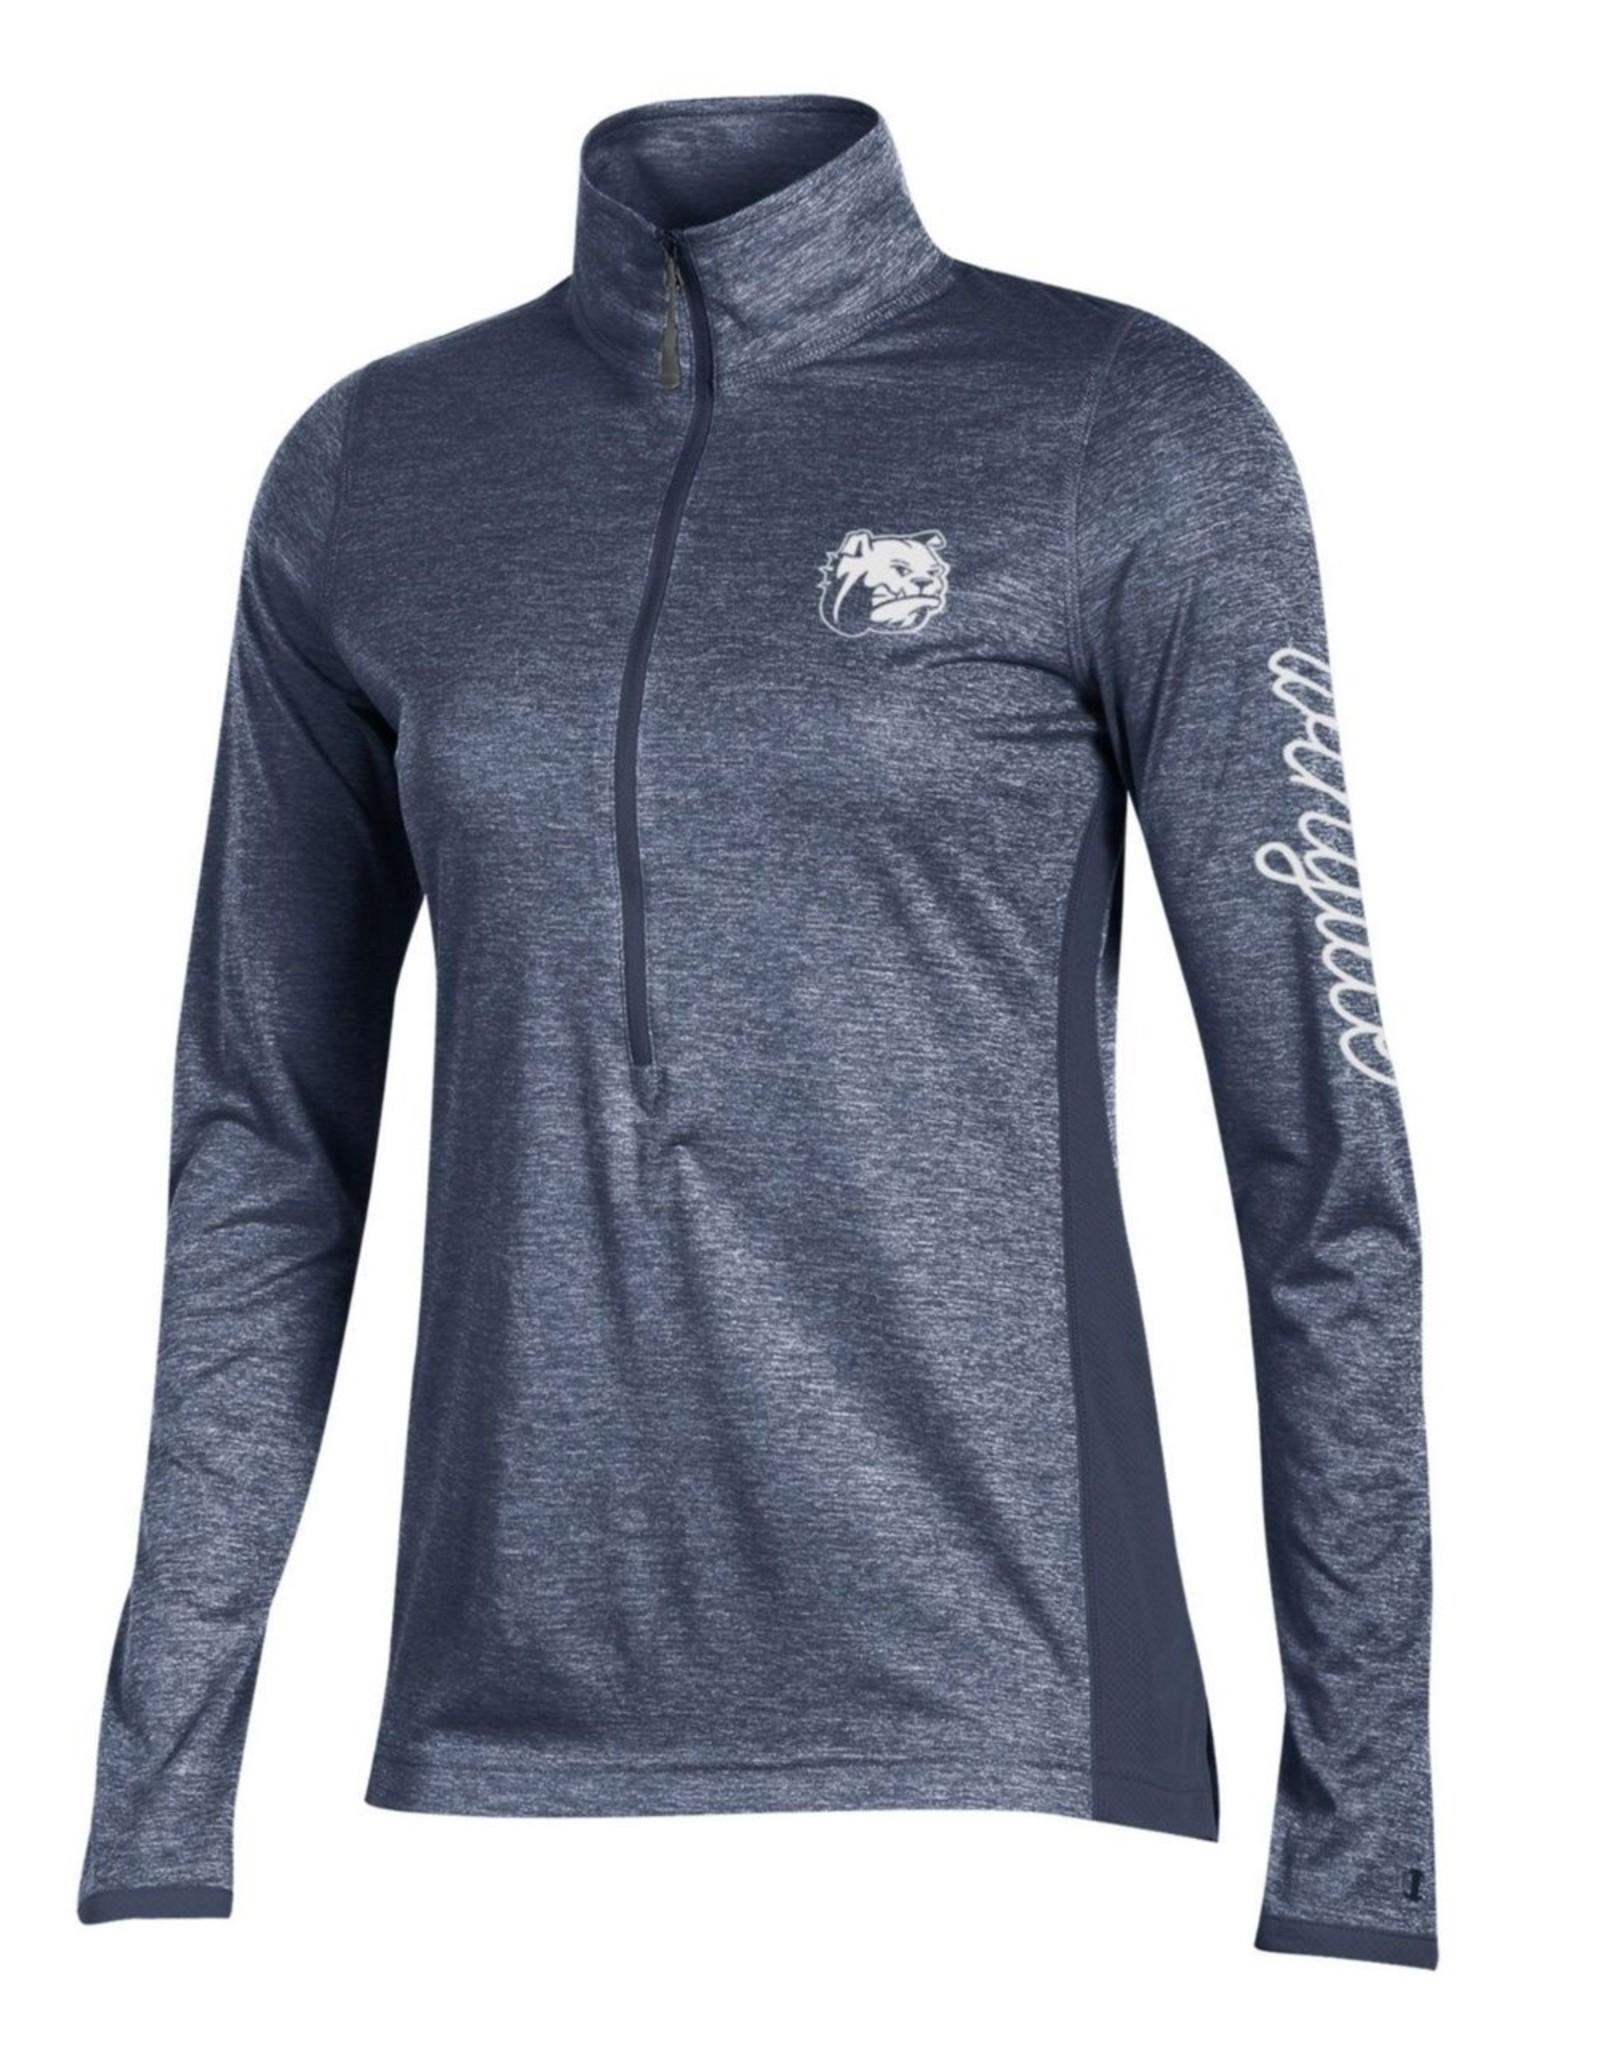 Ladies Marathon Navy 1/2 Zip